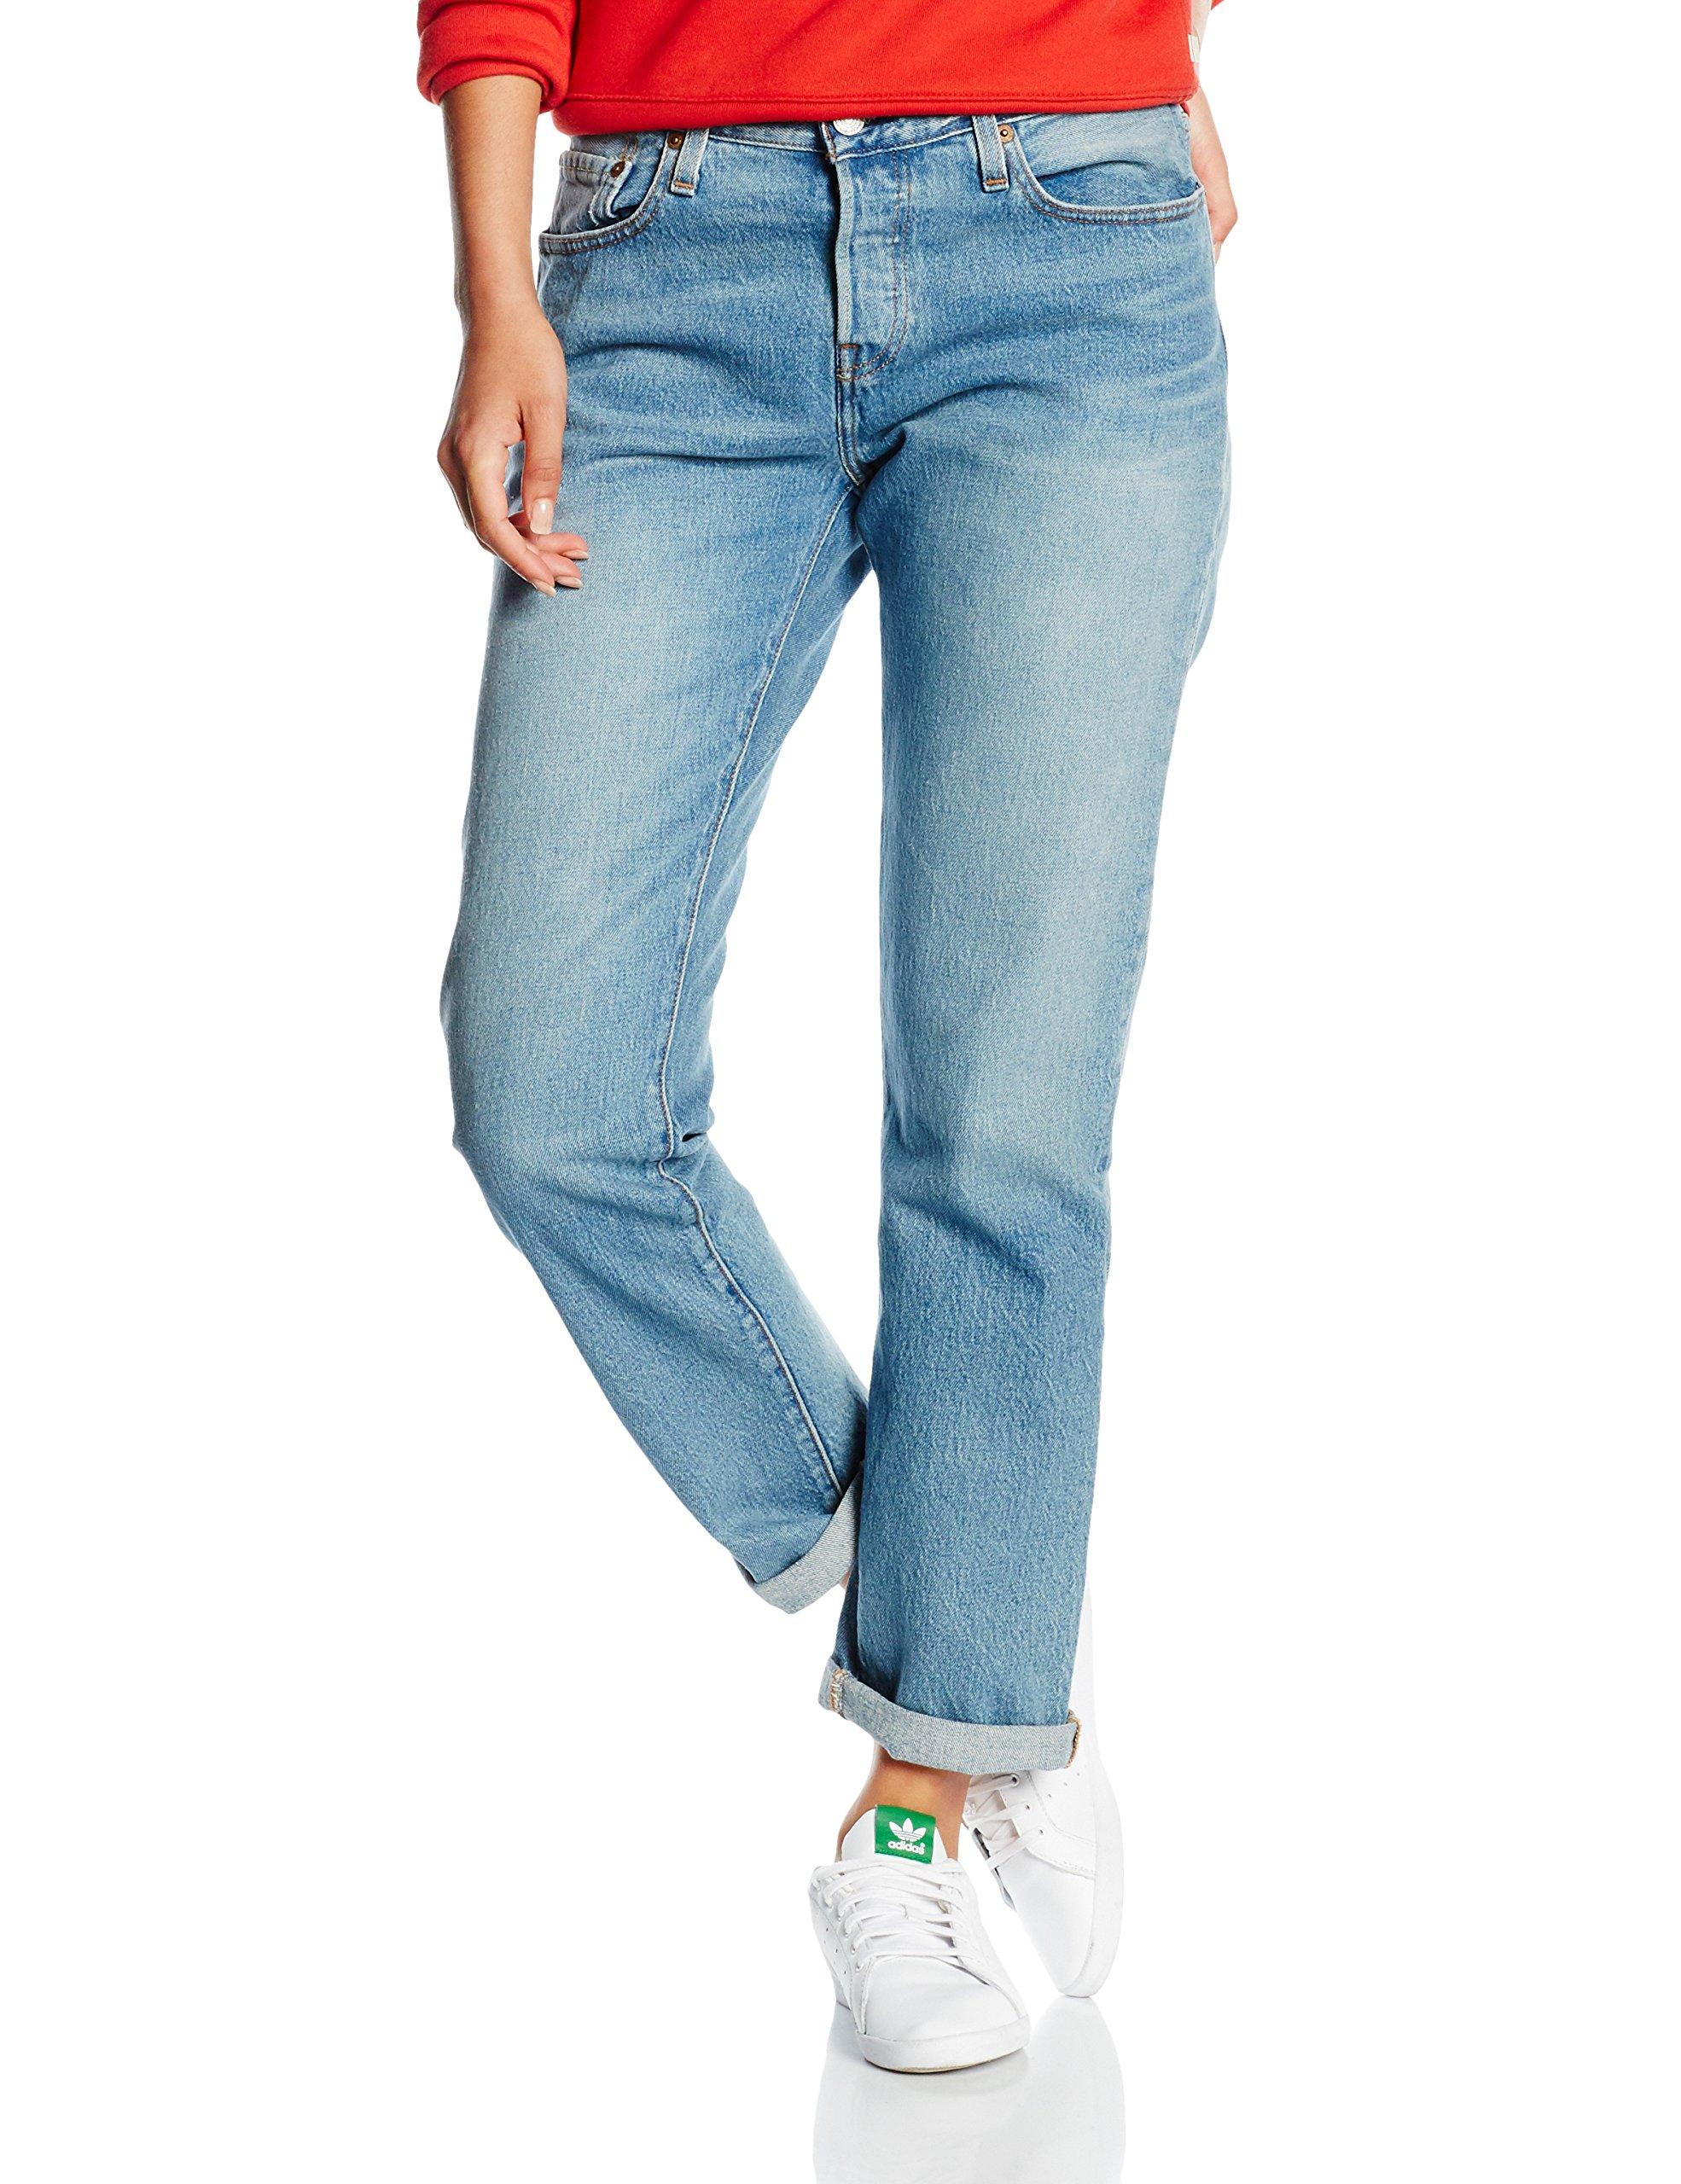 FemmeBleuisland Levi's Fabricant30 CtJeans l32taille AzureW30 501 34qARL5j